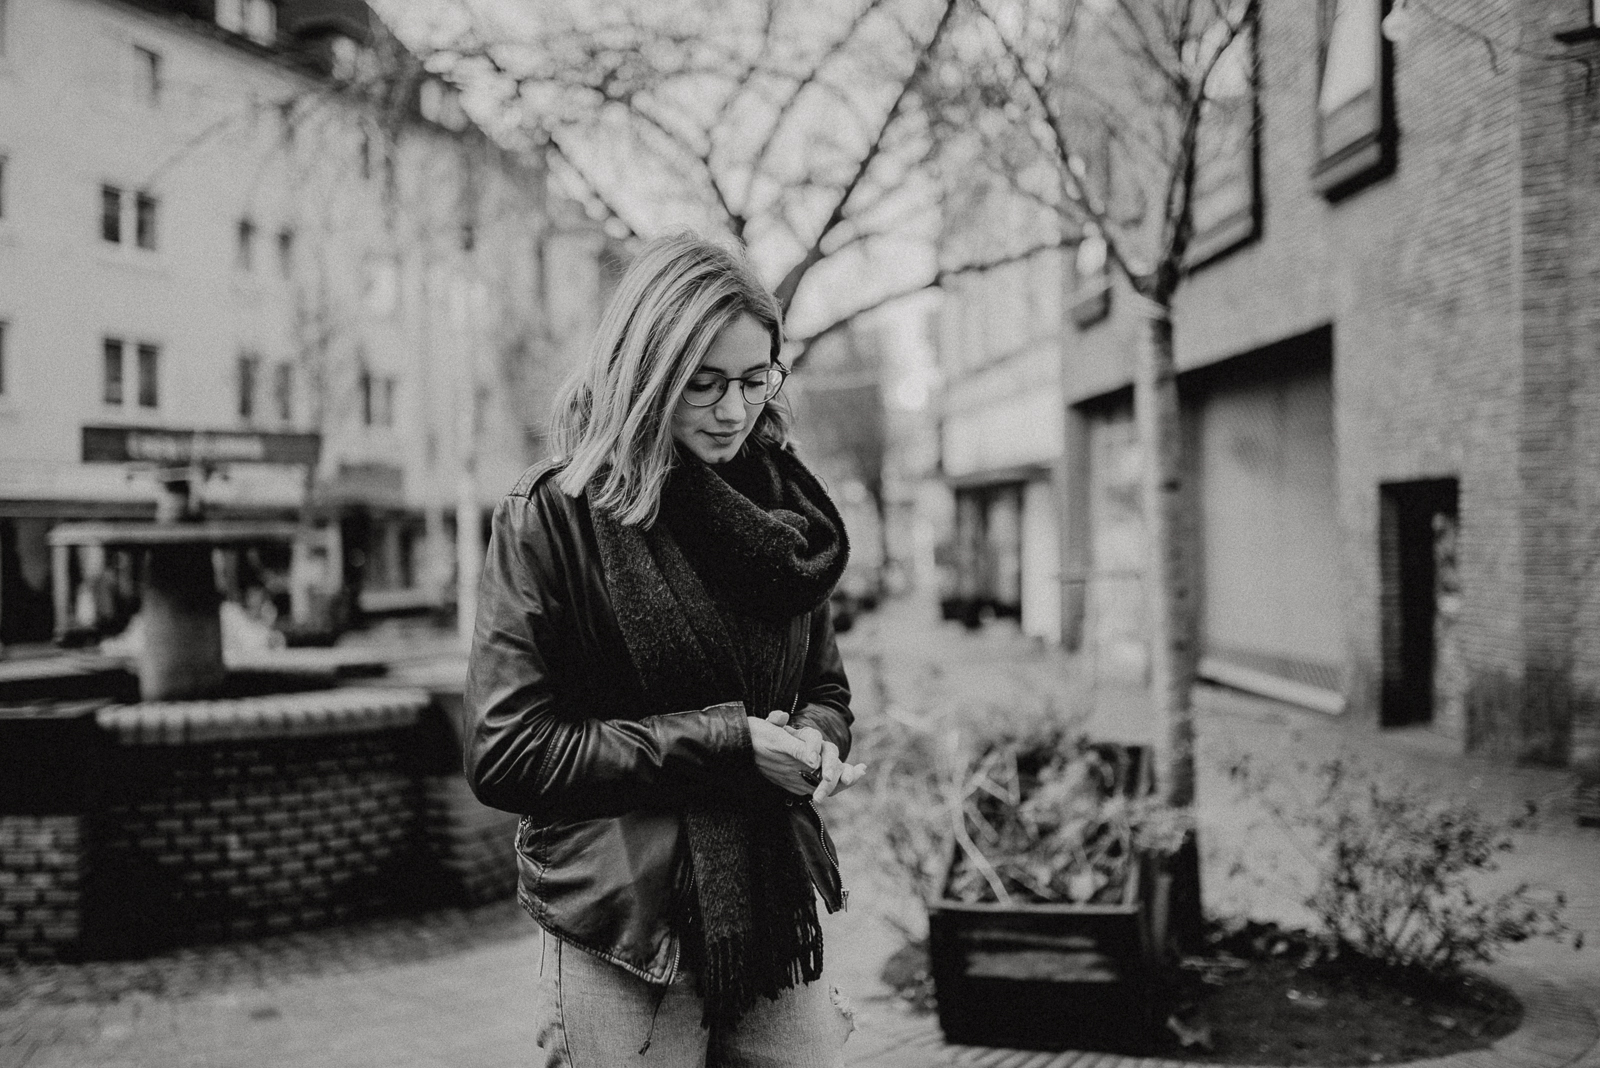 030-designparaplus-fotografin-witten-portrait-shooting-downtown